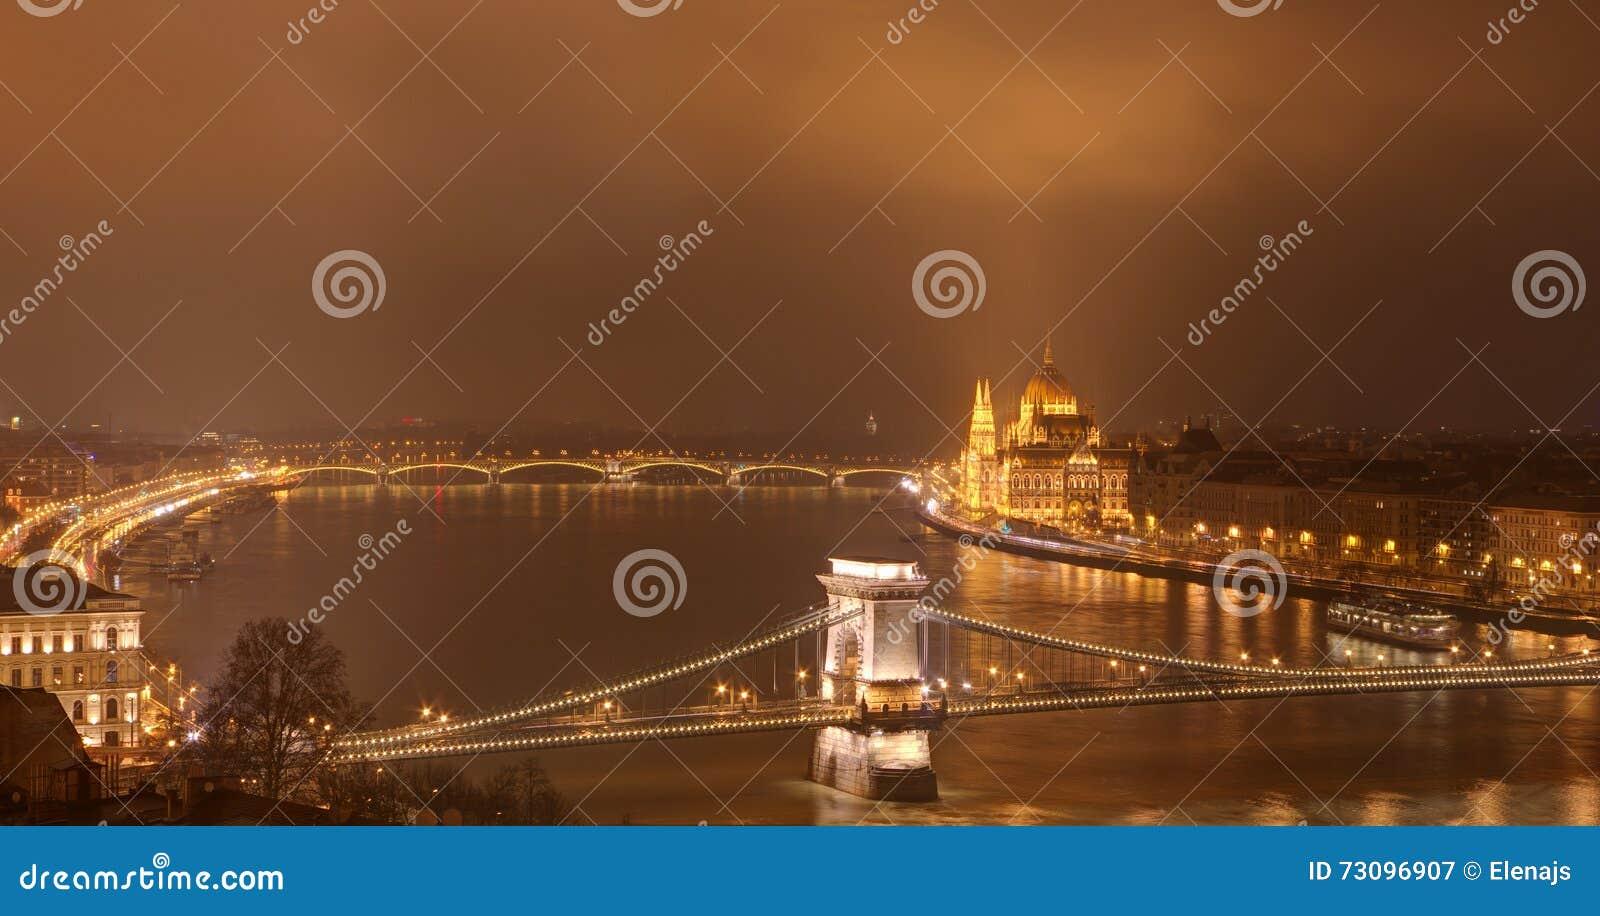 Budapest, Hungary by night - Chain bridge, Hungarian Parliament Building and Margaret bridge